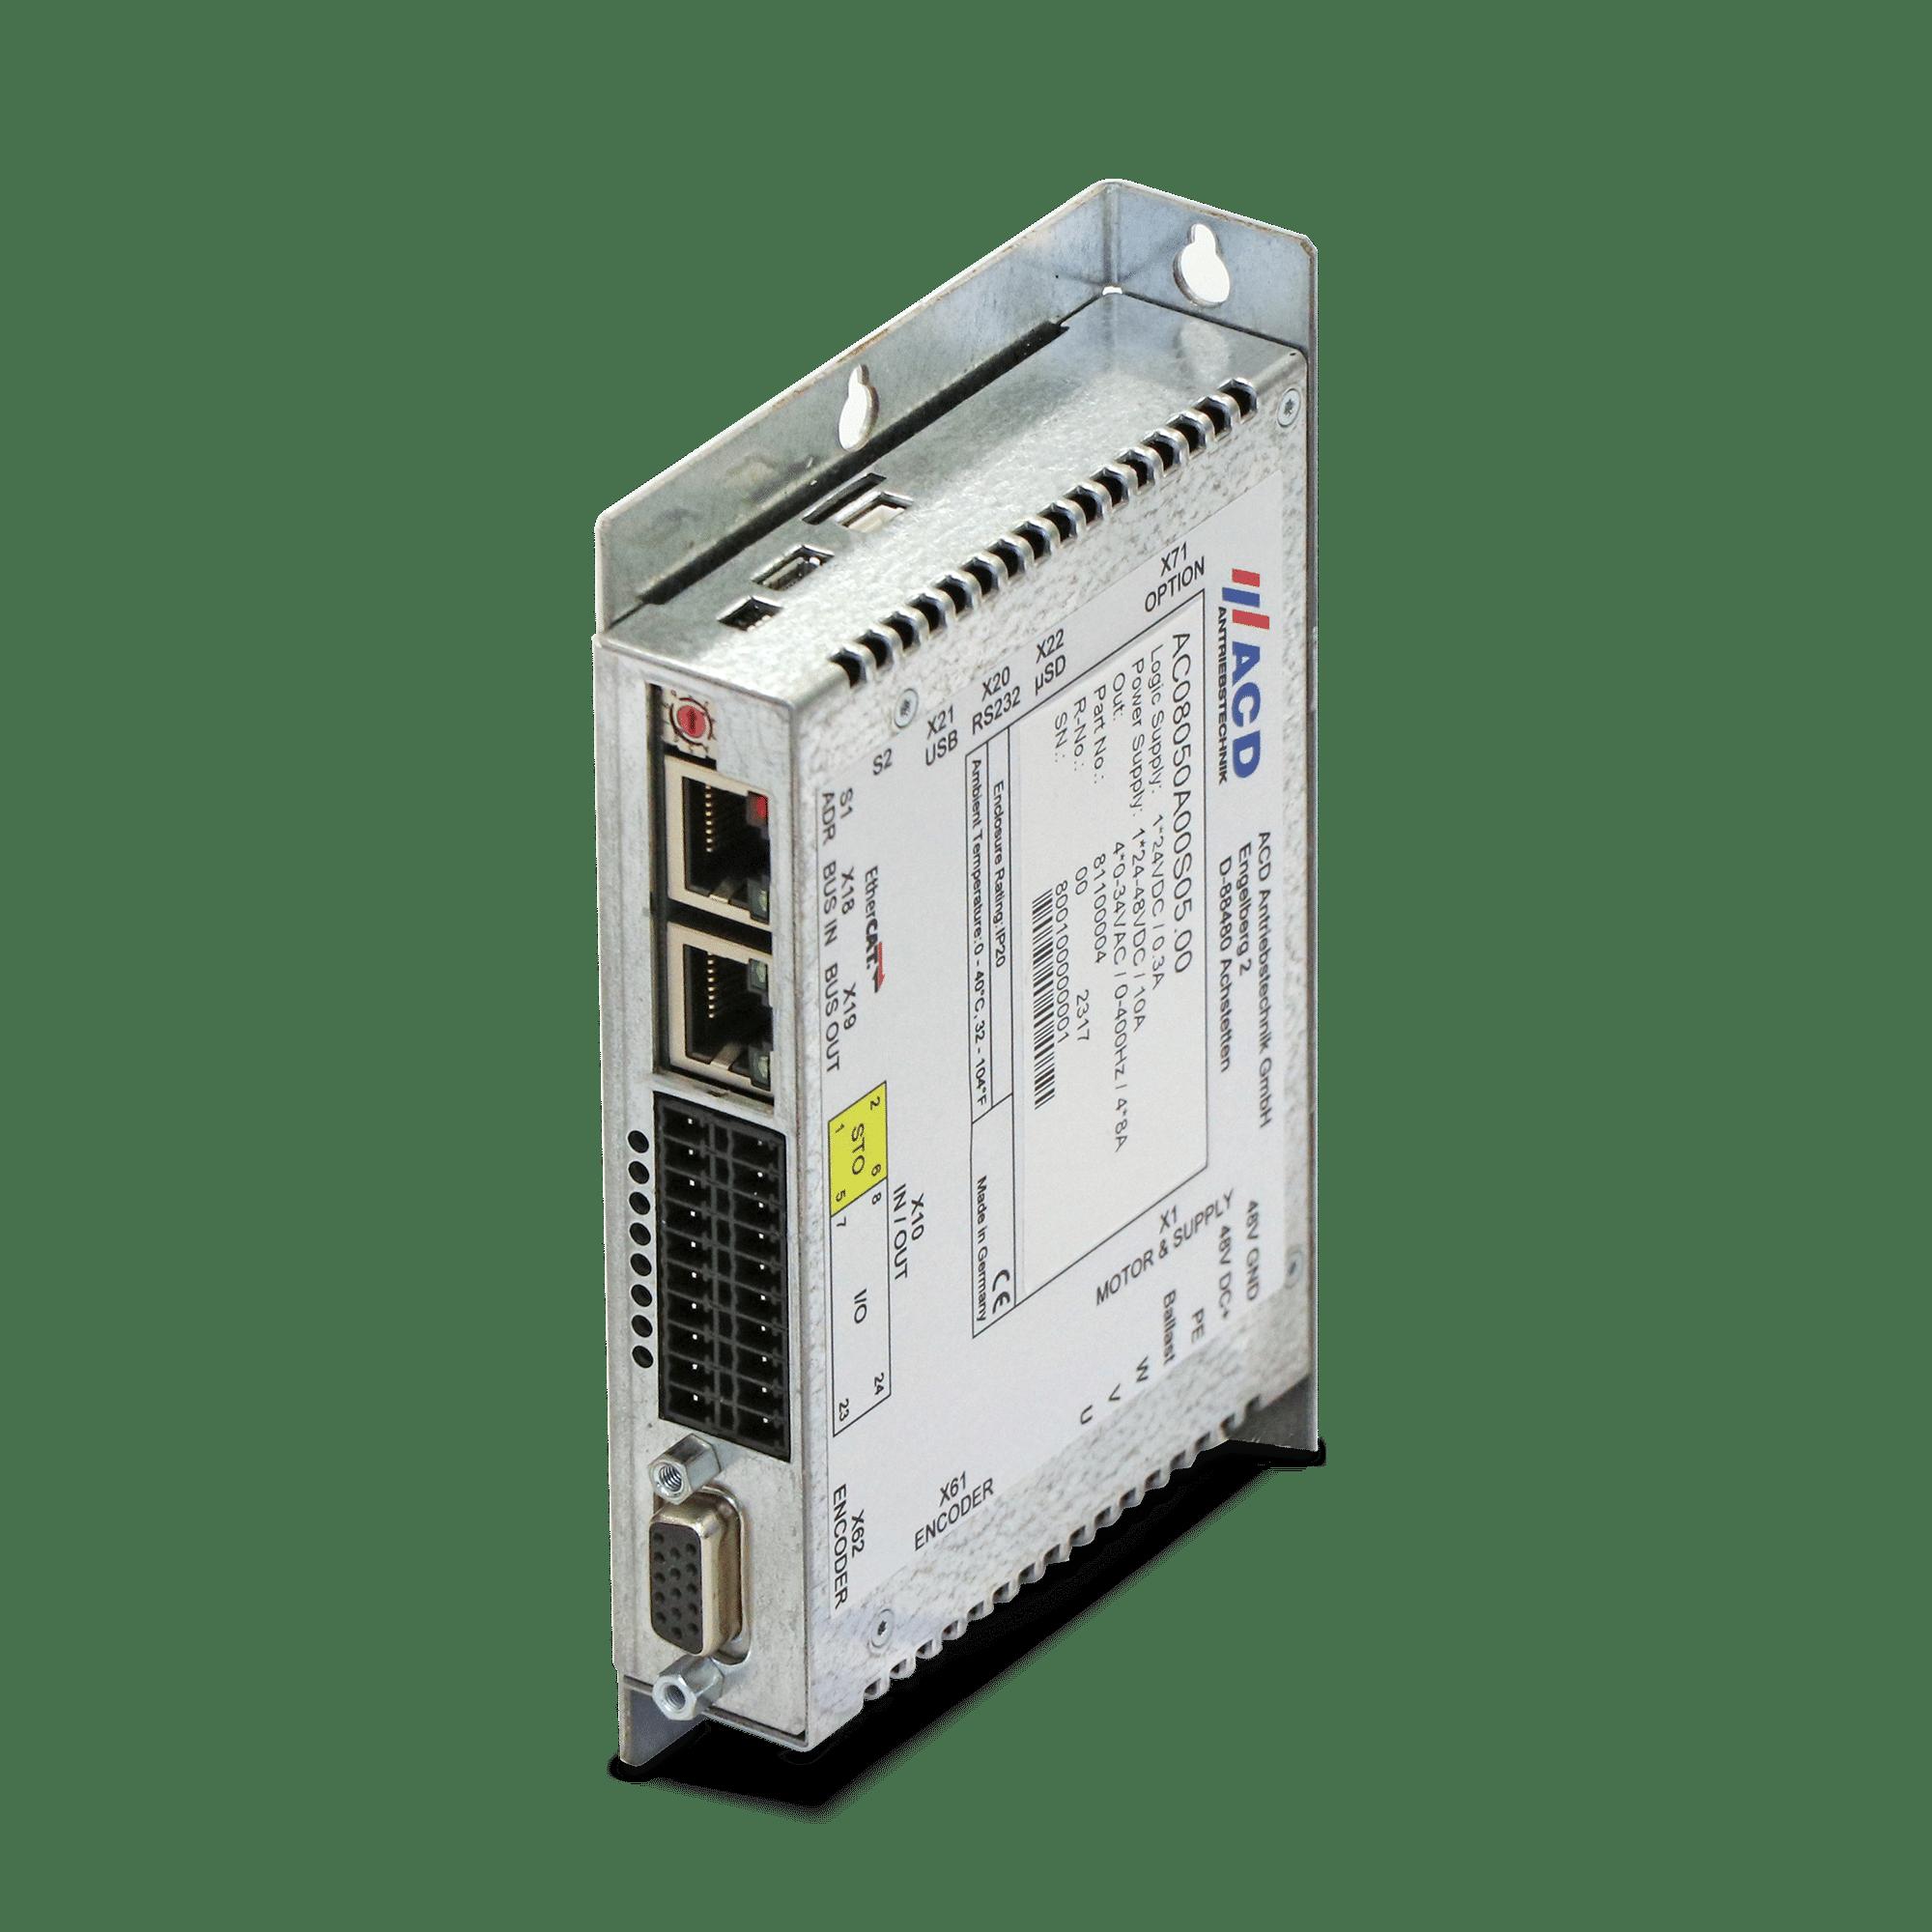 Drive Controller ACxx050A00S05.xx